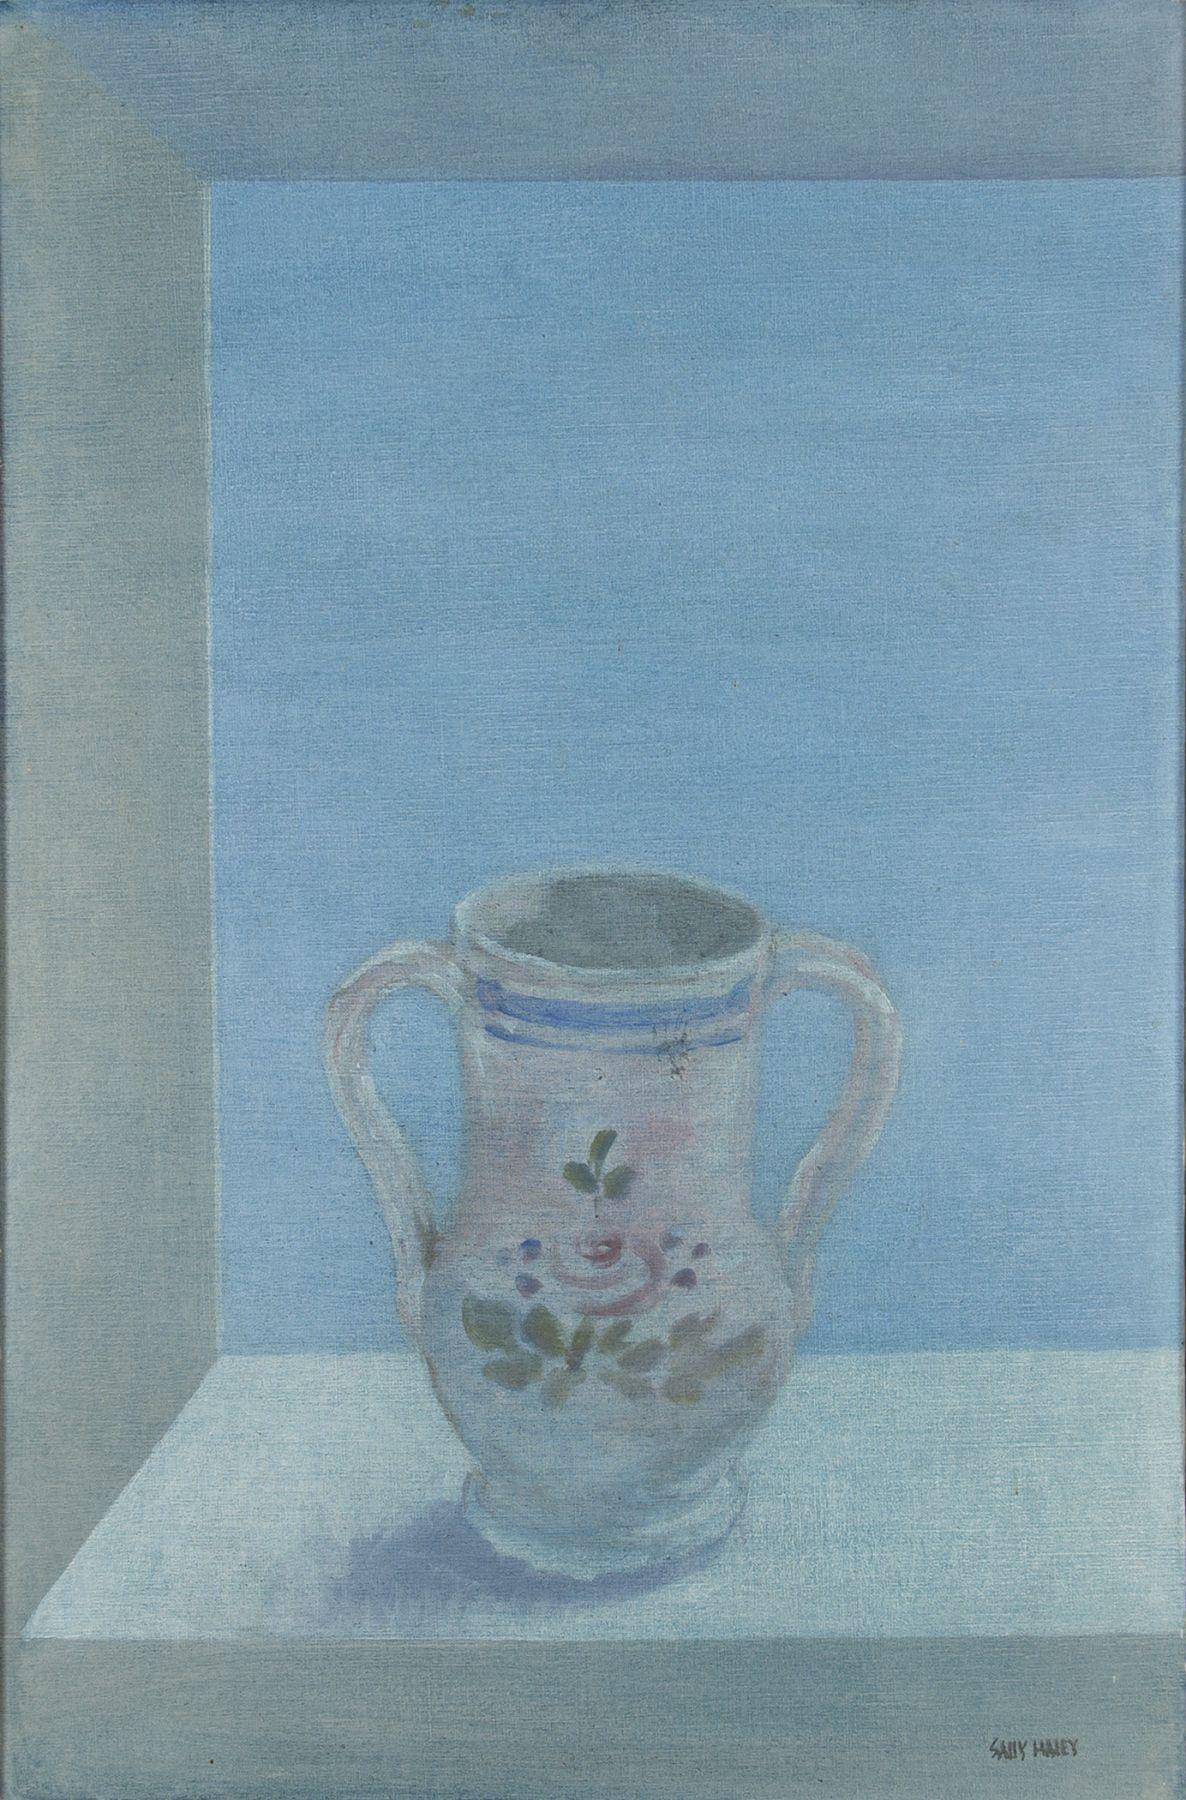 Sally Haley - vase on blue